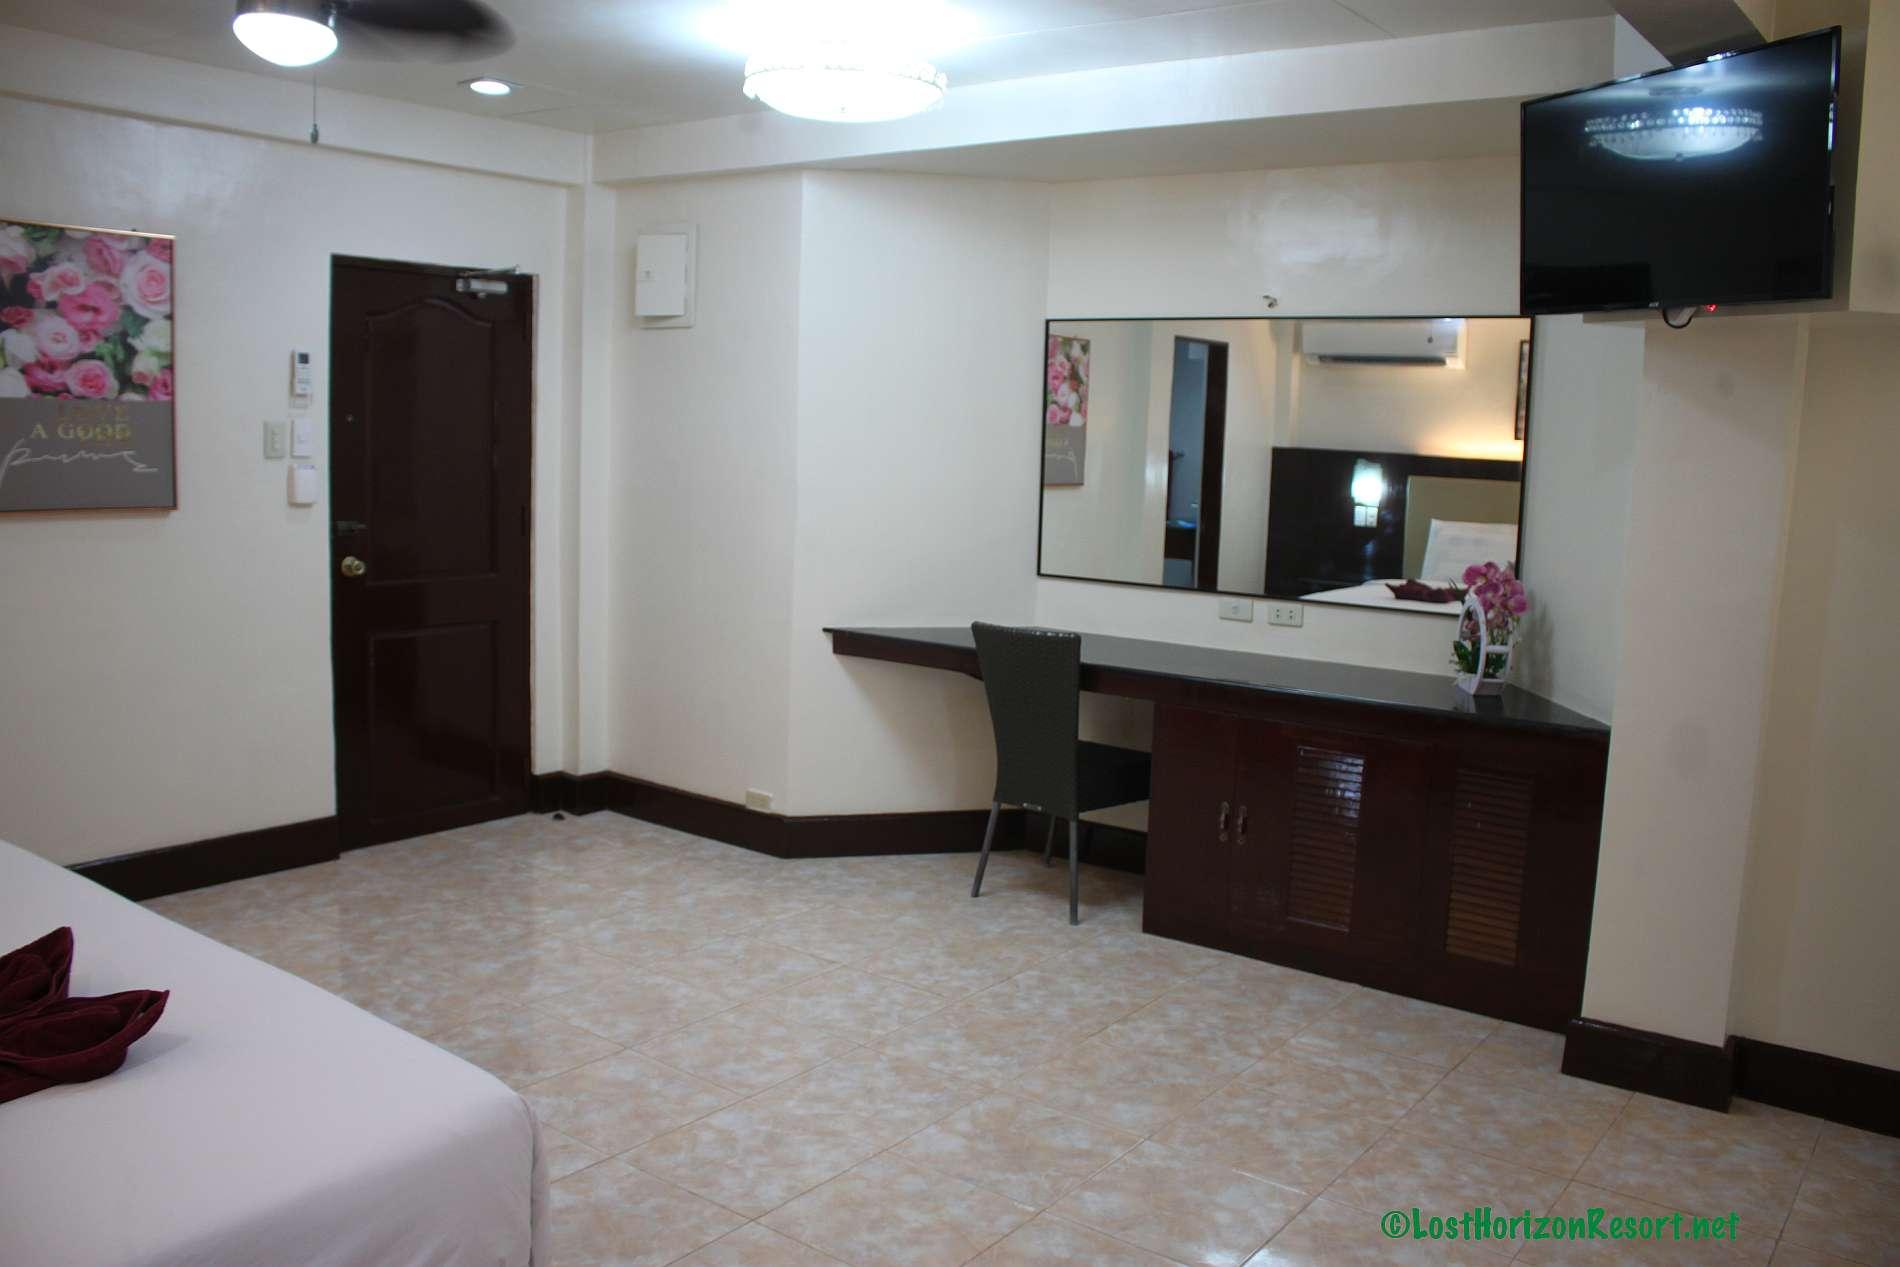 Lost-Horizon-Beach-Resort-Alona-Beach-Panglao-Bohol-Philippines-sun-view-room069